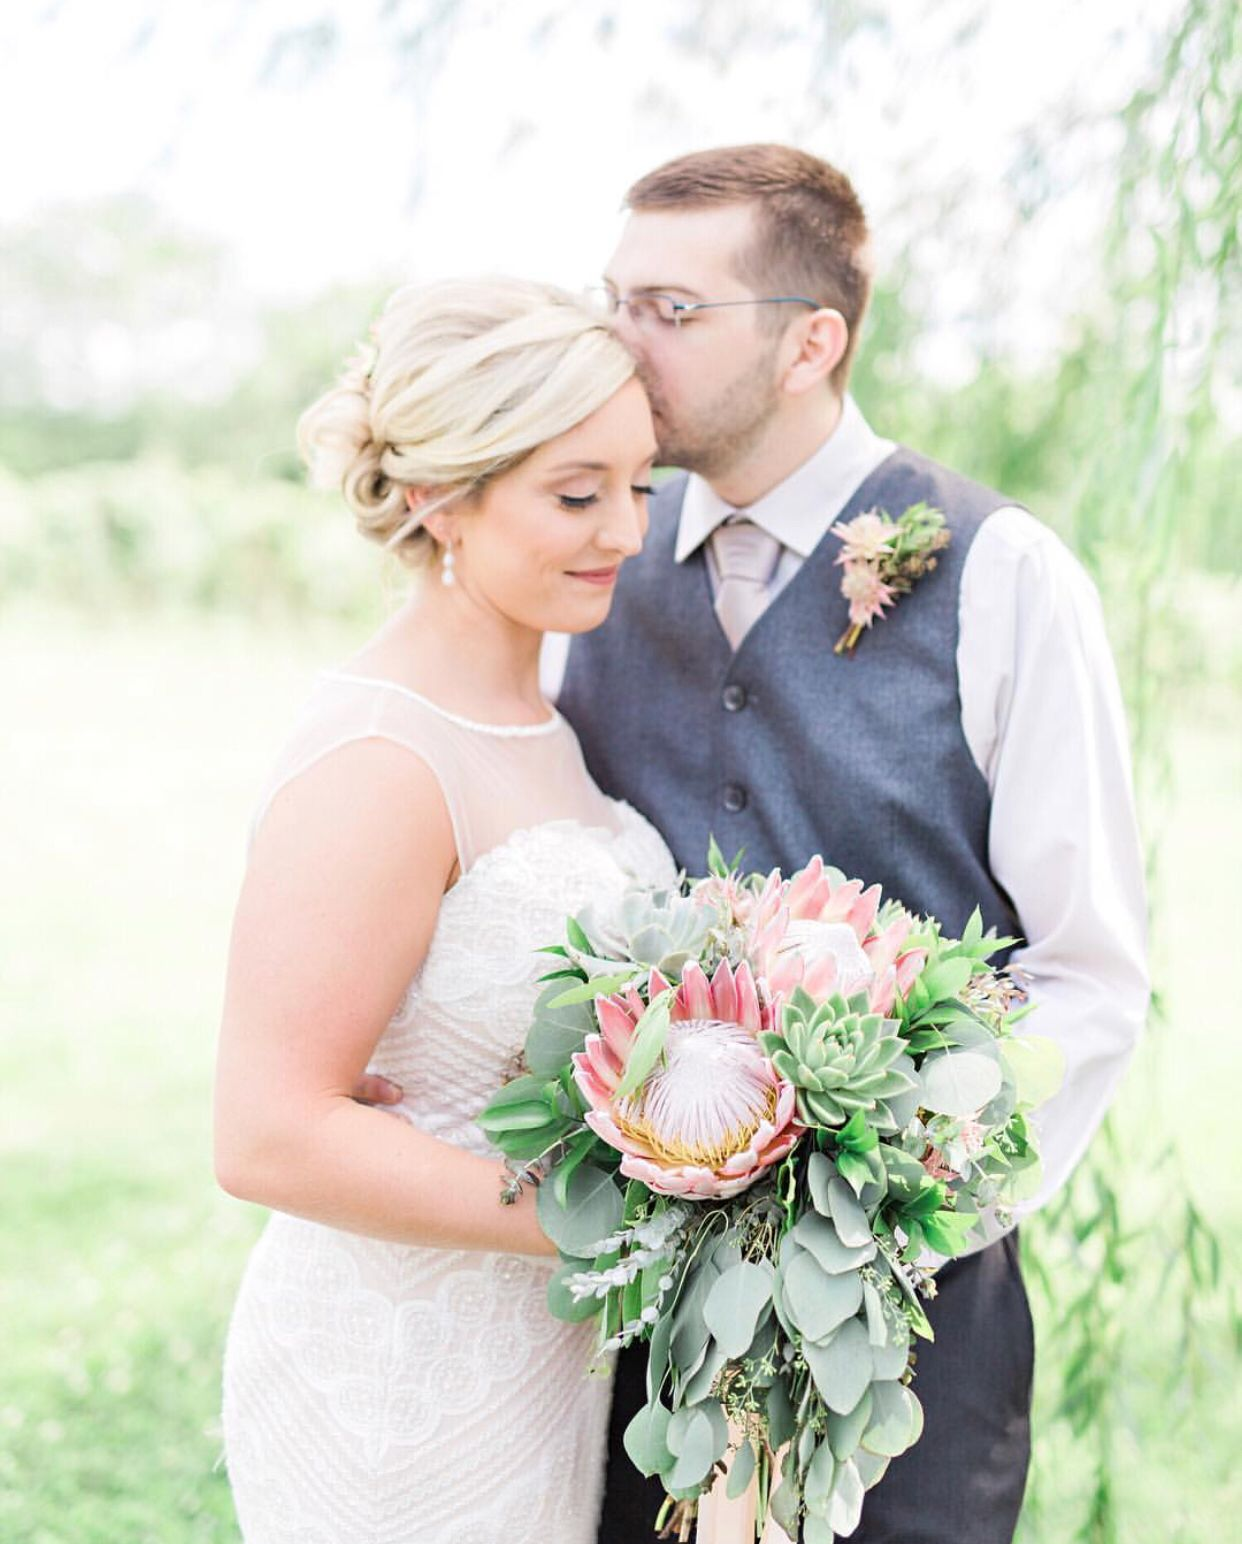 Celebrity Wedding Flowers Centerpieces: Wedding Bouquets - Wedding Florist